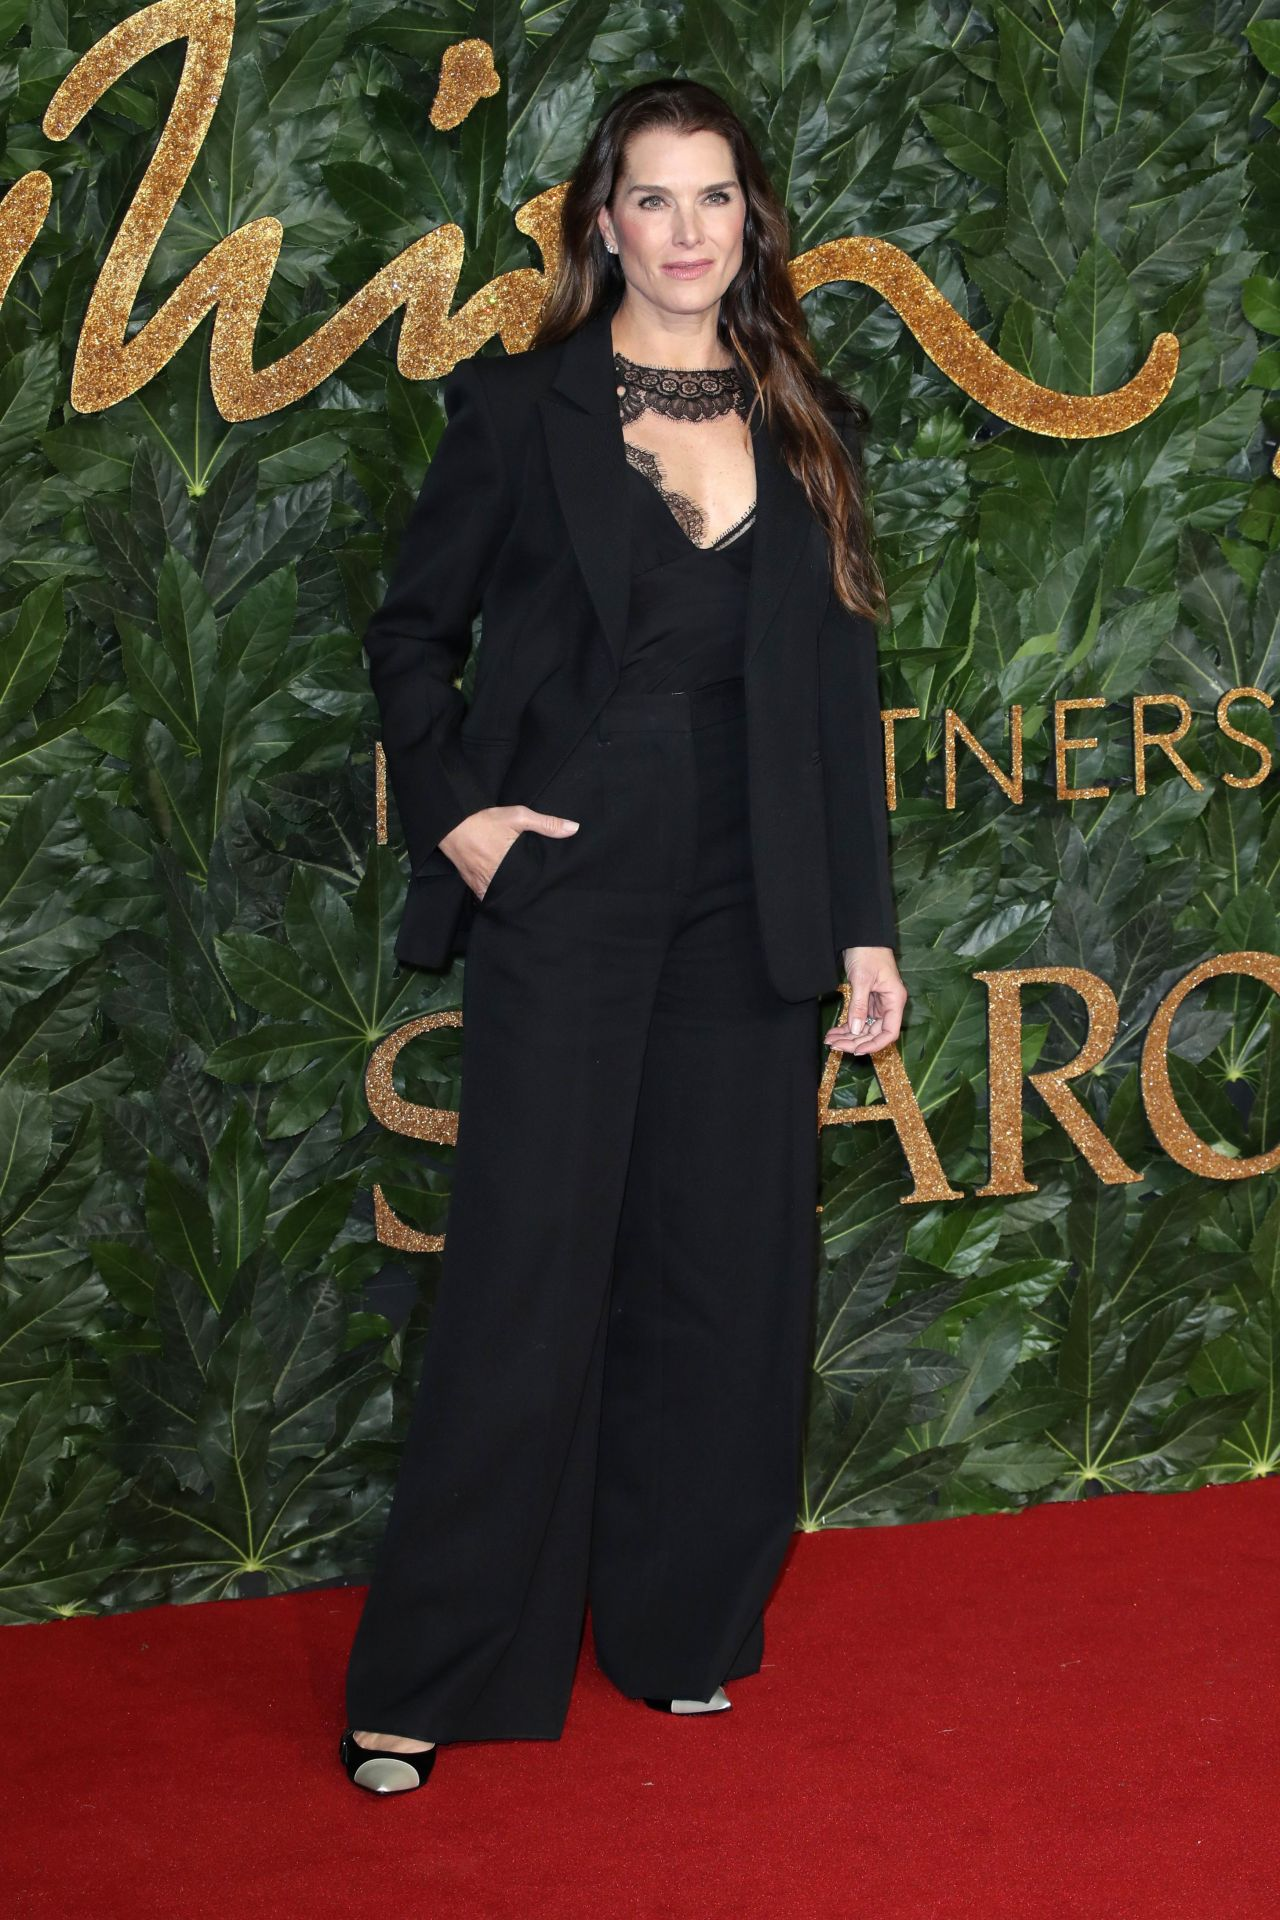 https://celebmafia.com/wp-content/uploads/2018/12/brooke-shields-the-fashion-awards-2018-in-london-2.jpg